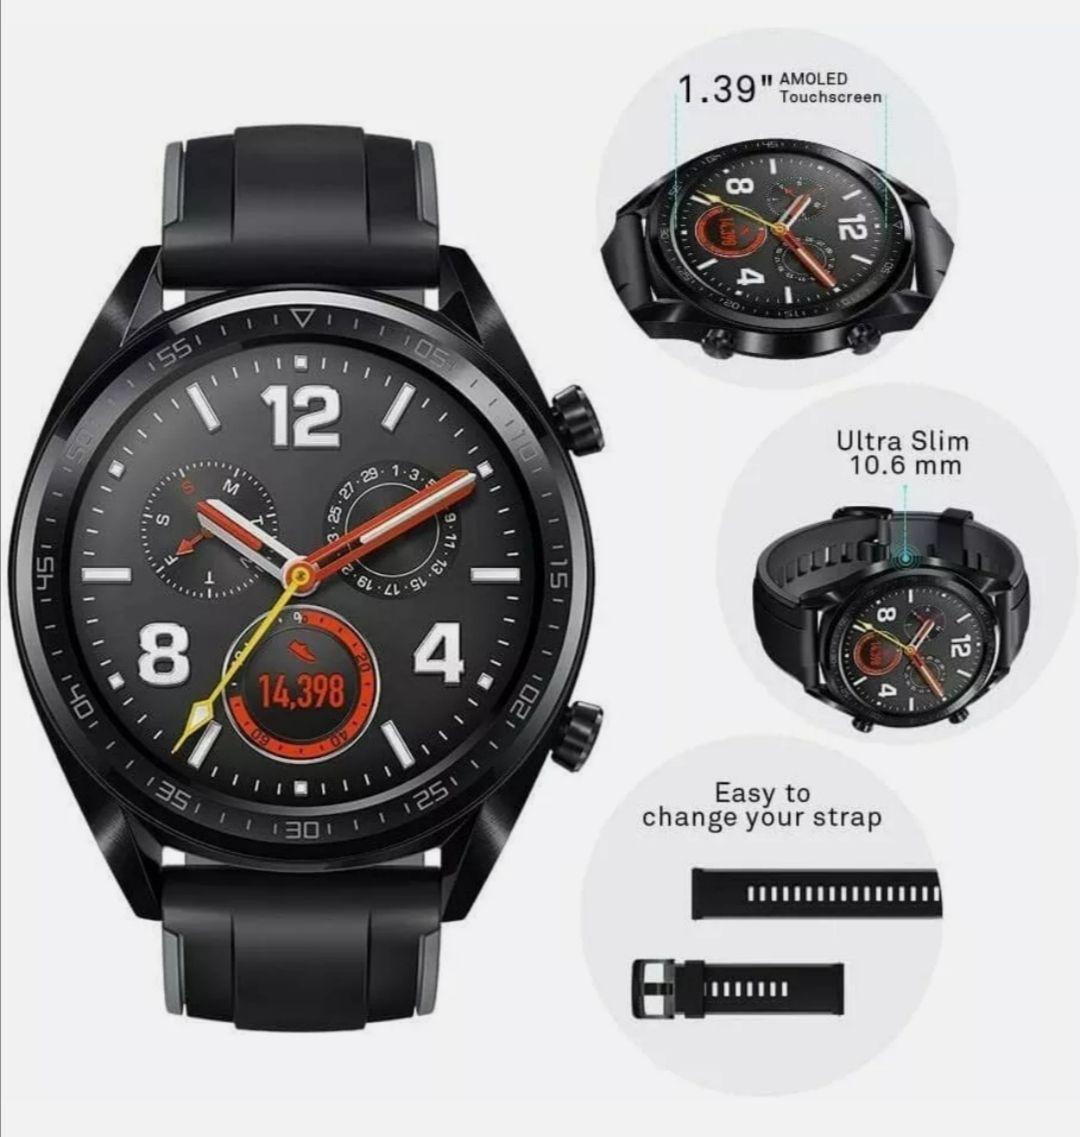 Brand New Huawei Watch GT - FTN-B19 - Black Stainless Steel - Smartwatch - 46mm (14 - 21 Day Battery) - £71.99 @ Mobile Deals UK / Ebay